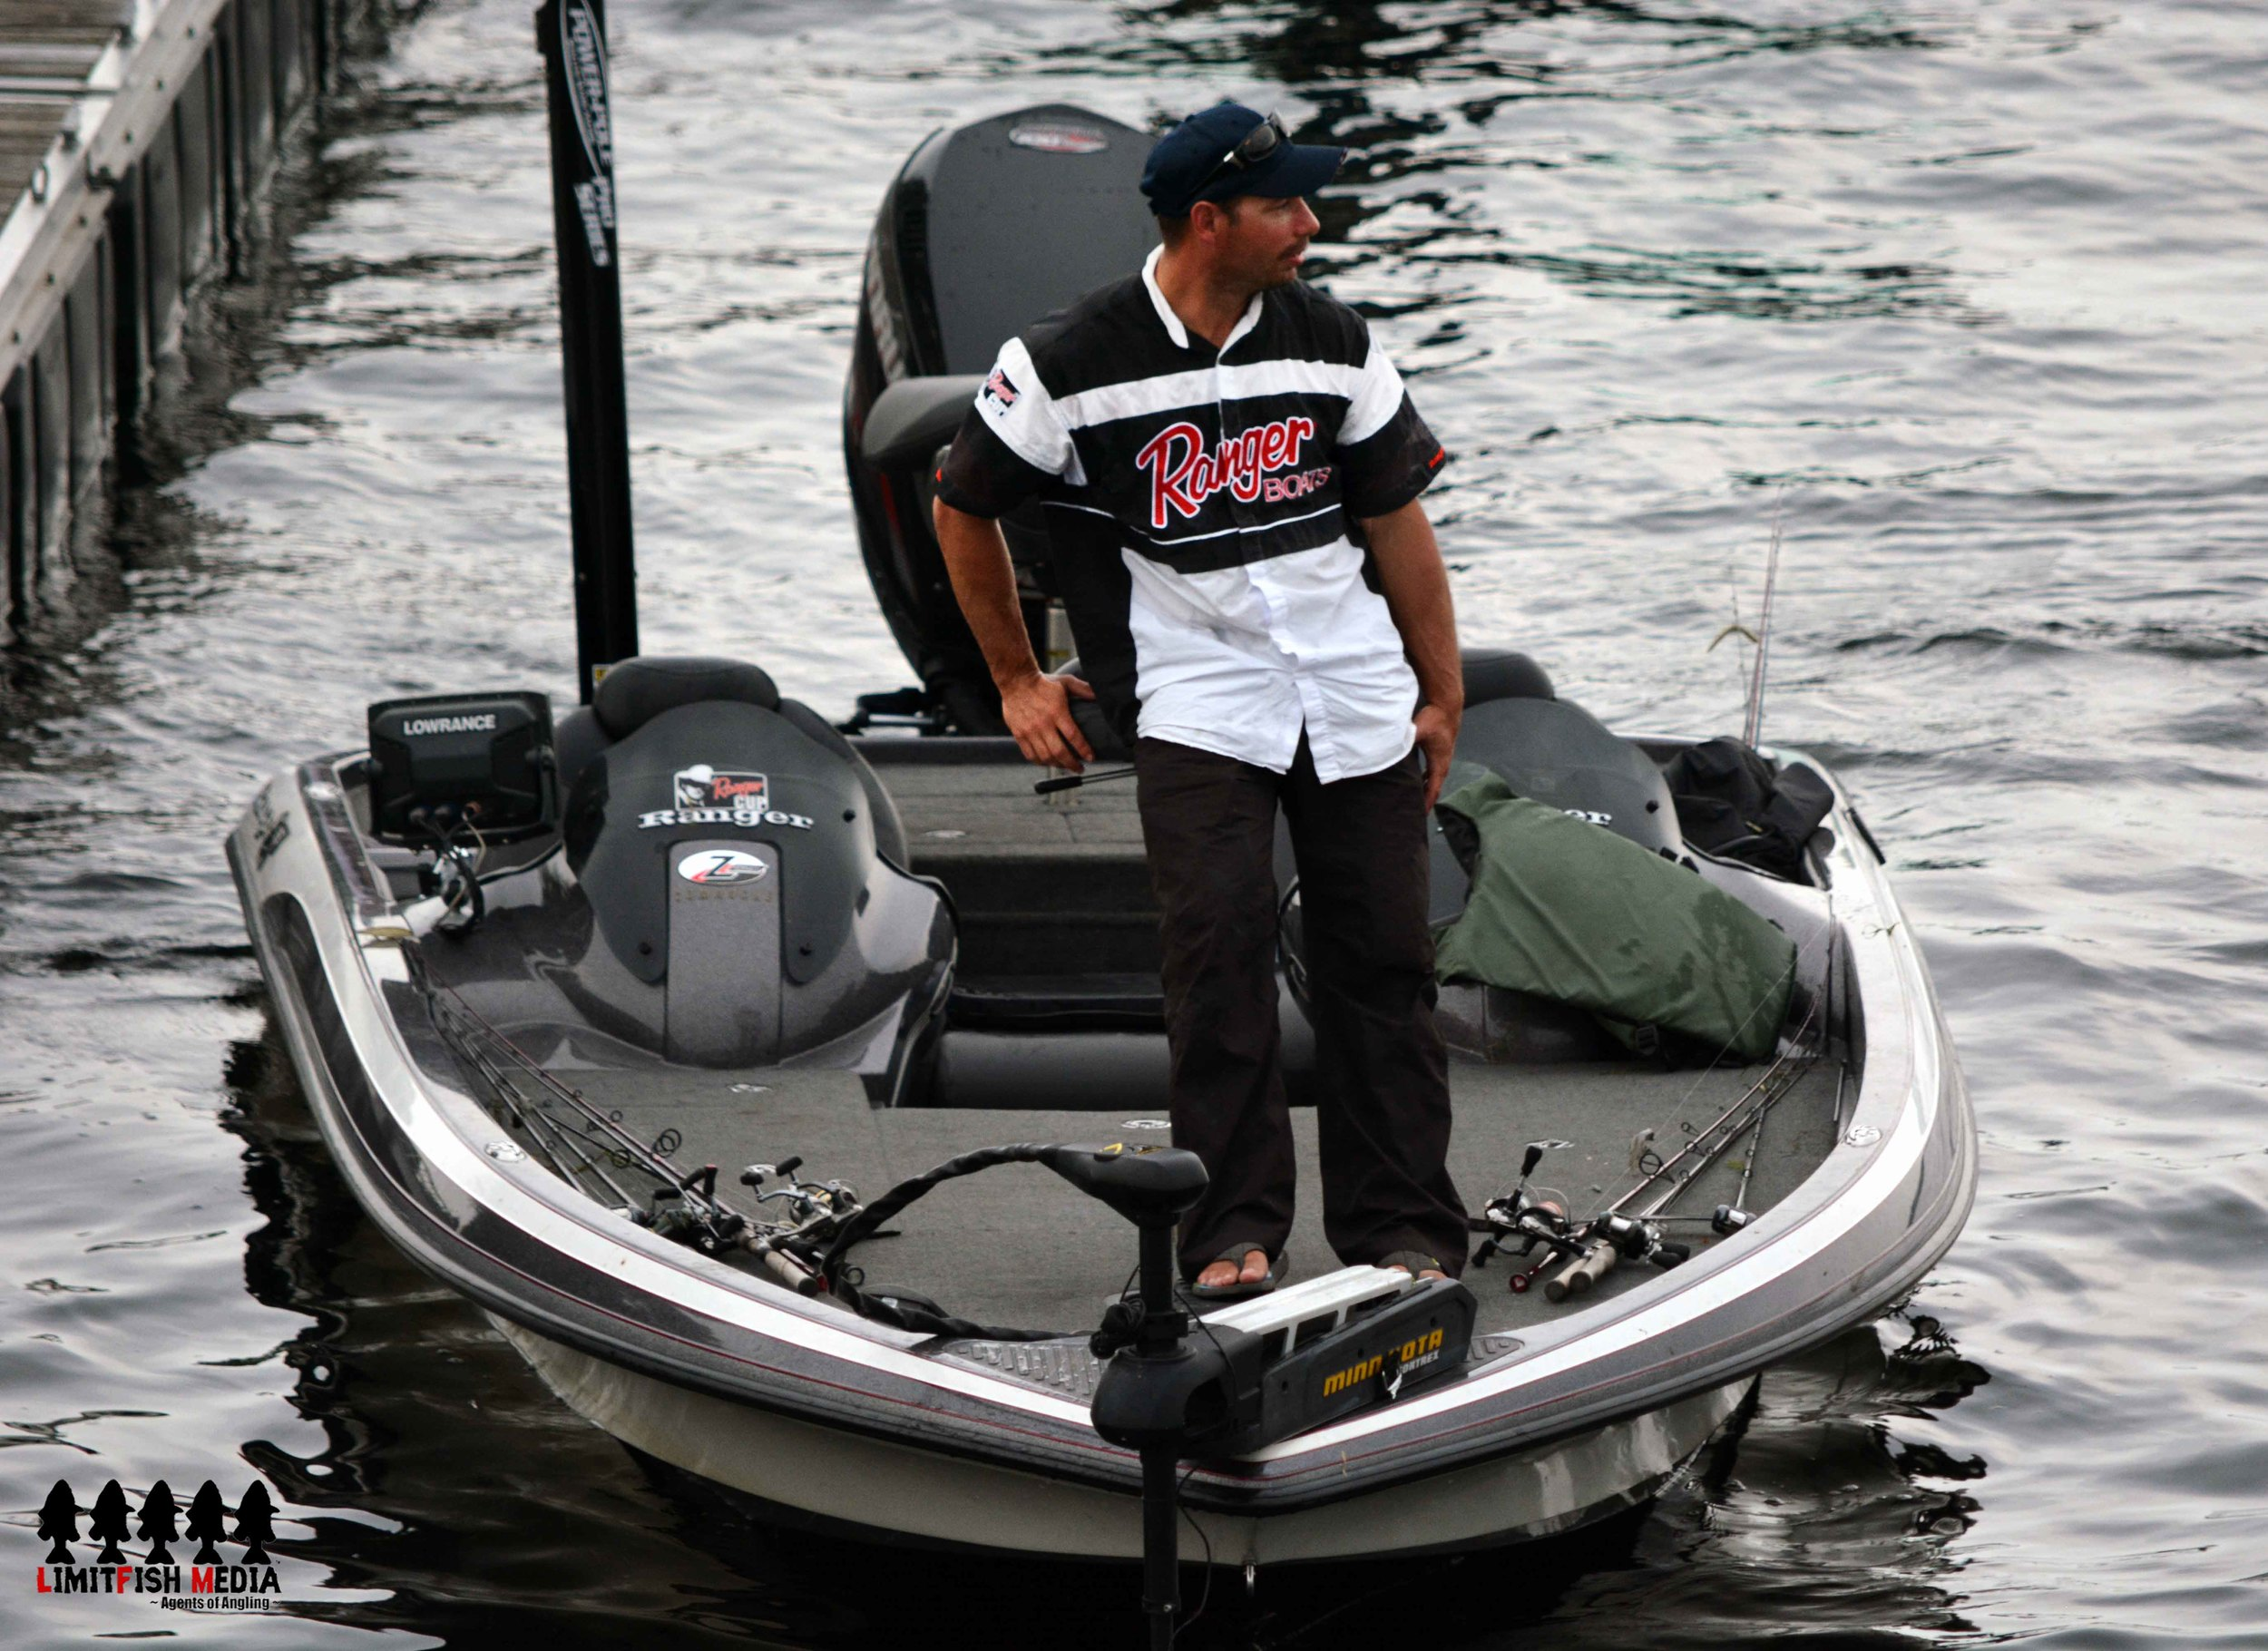 Angler at work